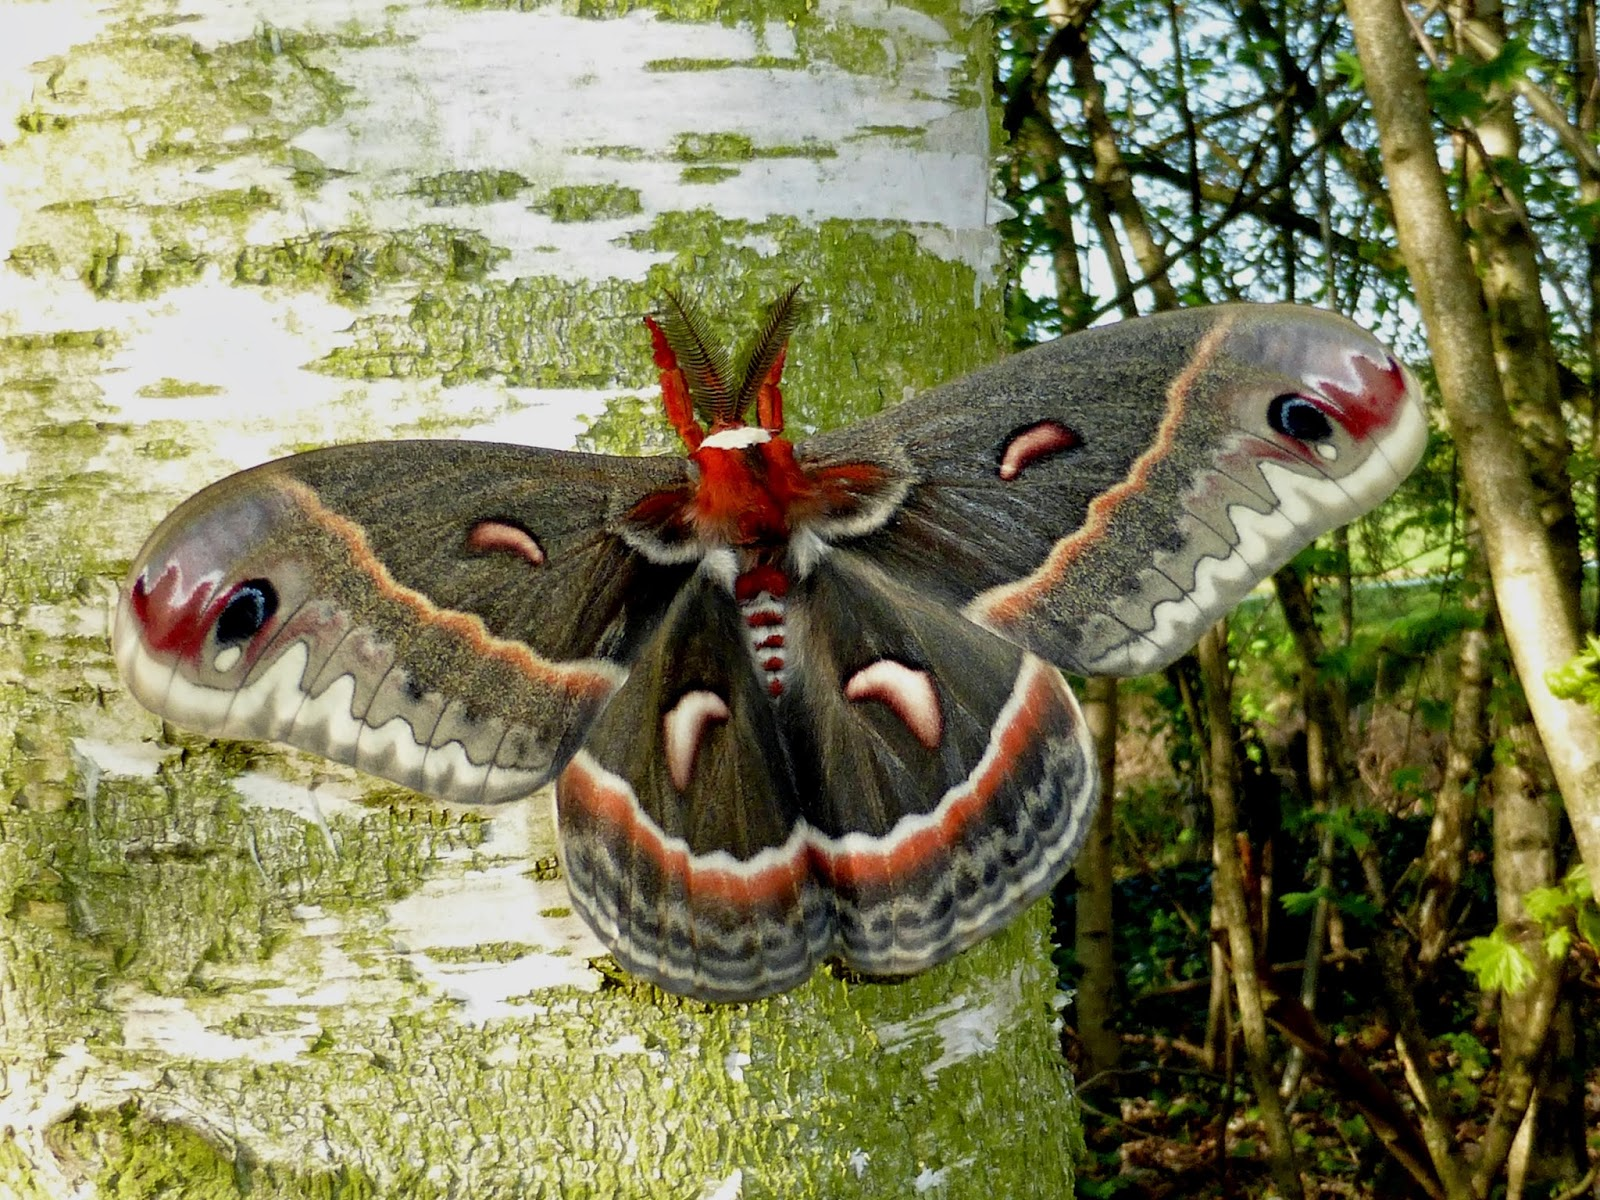 Hyalophora cecropia x kasloensis hybrid male